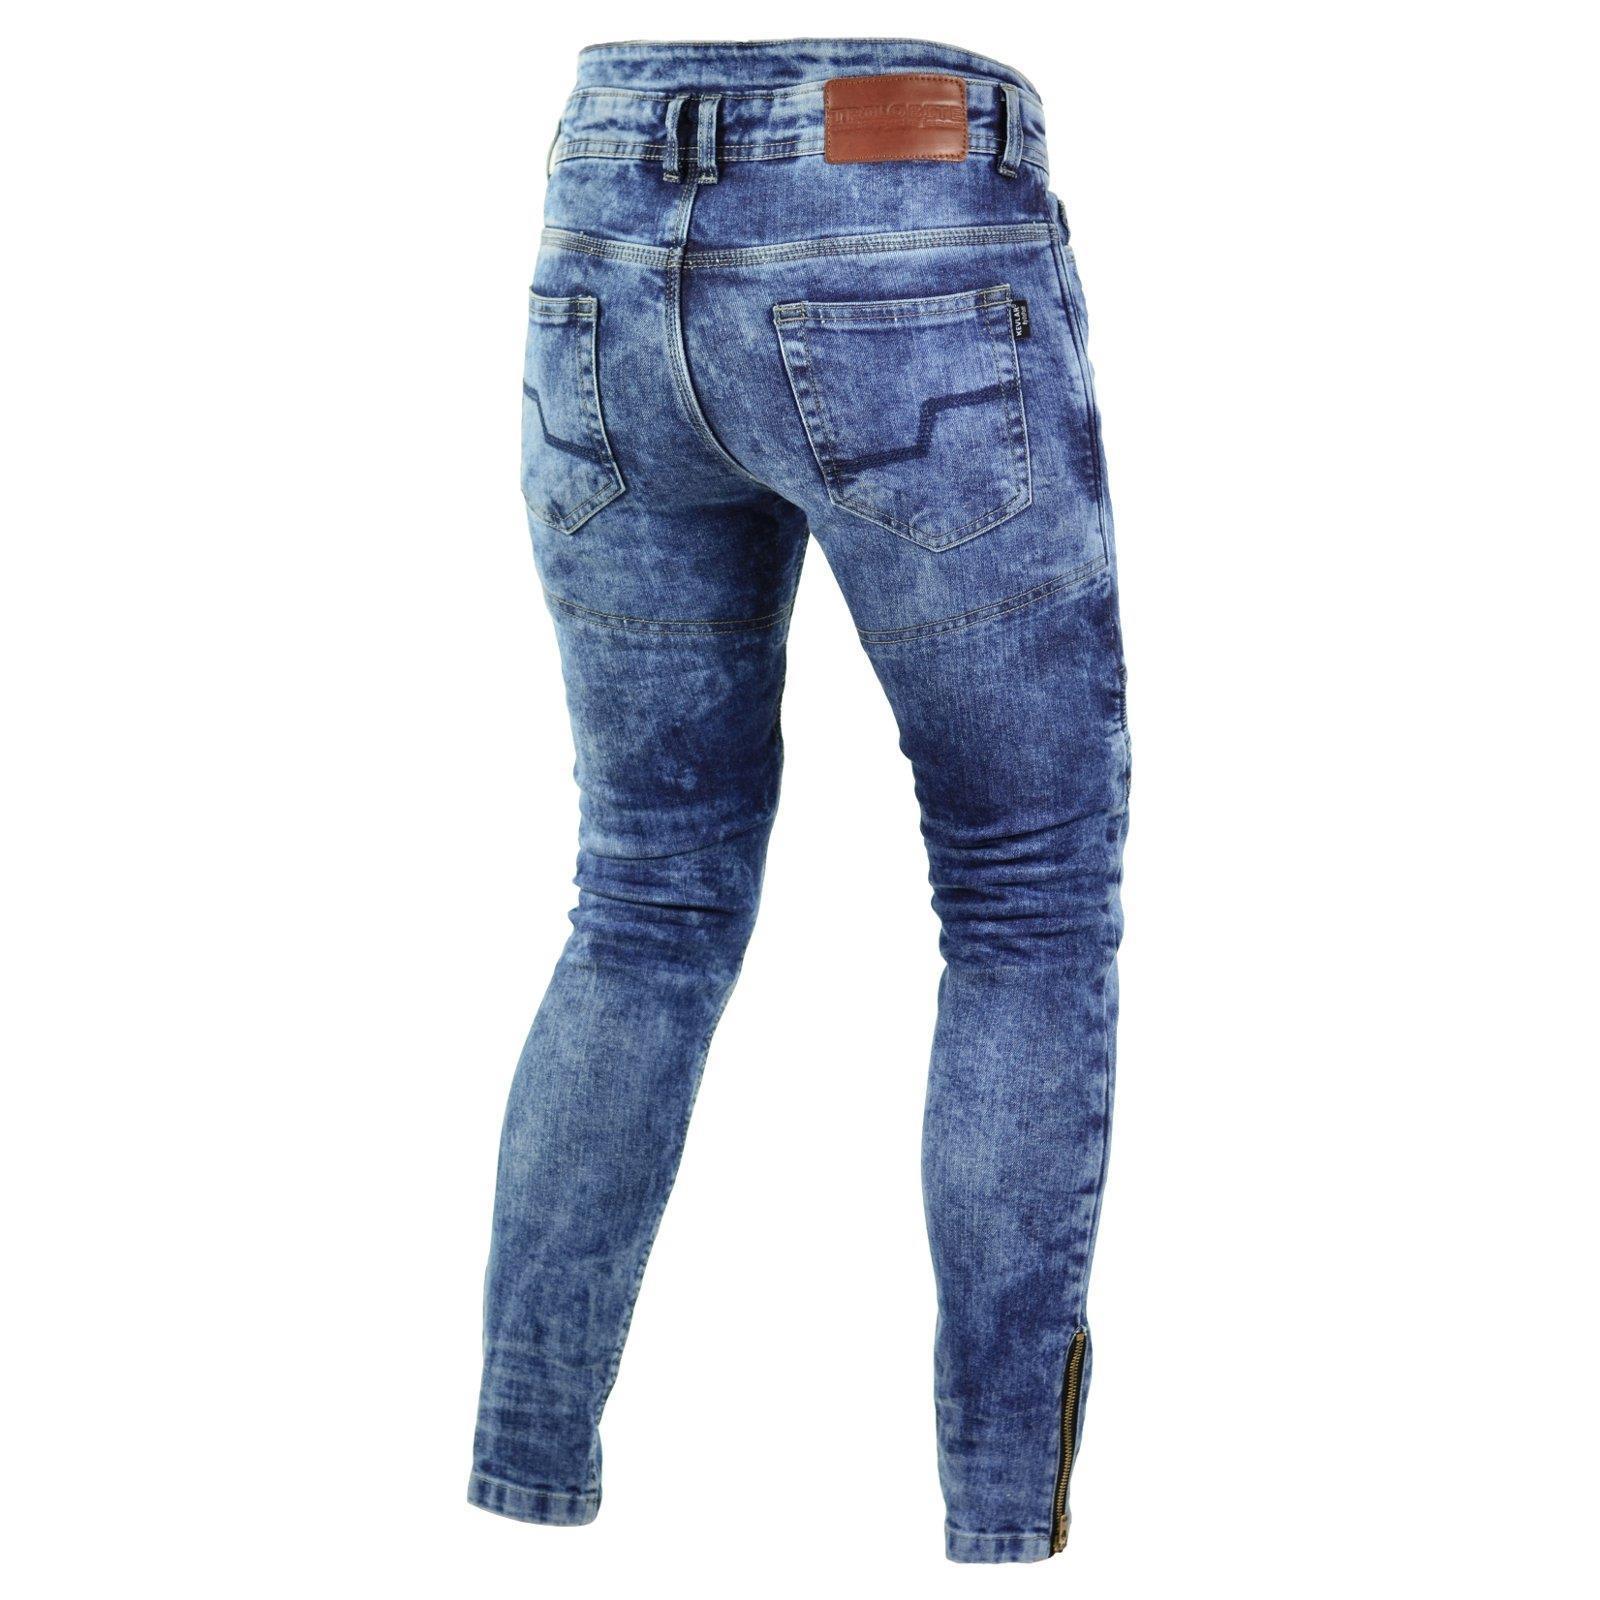 Trilobite-Pantaloni-Moto-Jeans-Abbigliamento-Parado-MICAS-URBAN-DUAL-PANTS-ACID miniatura 93